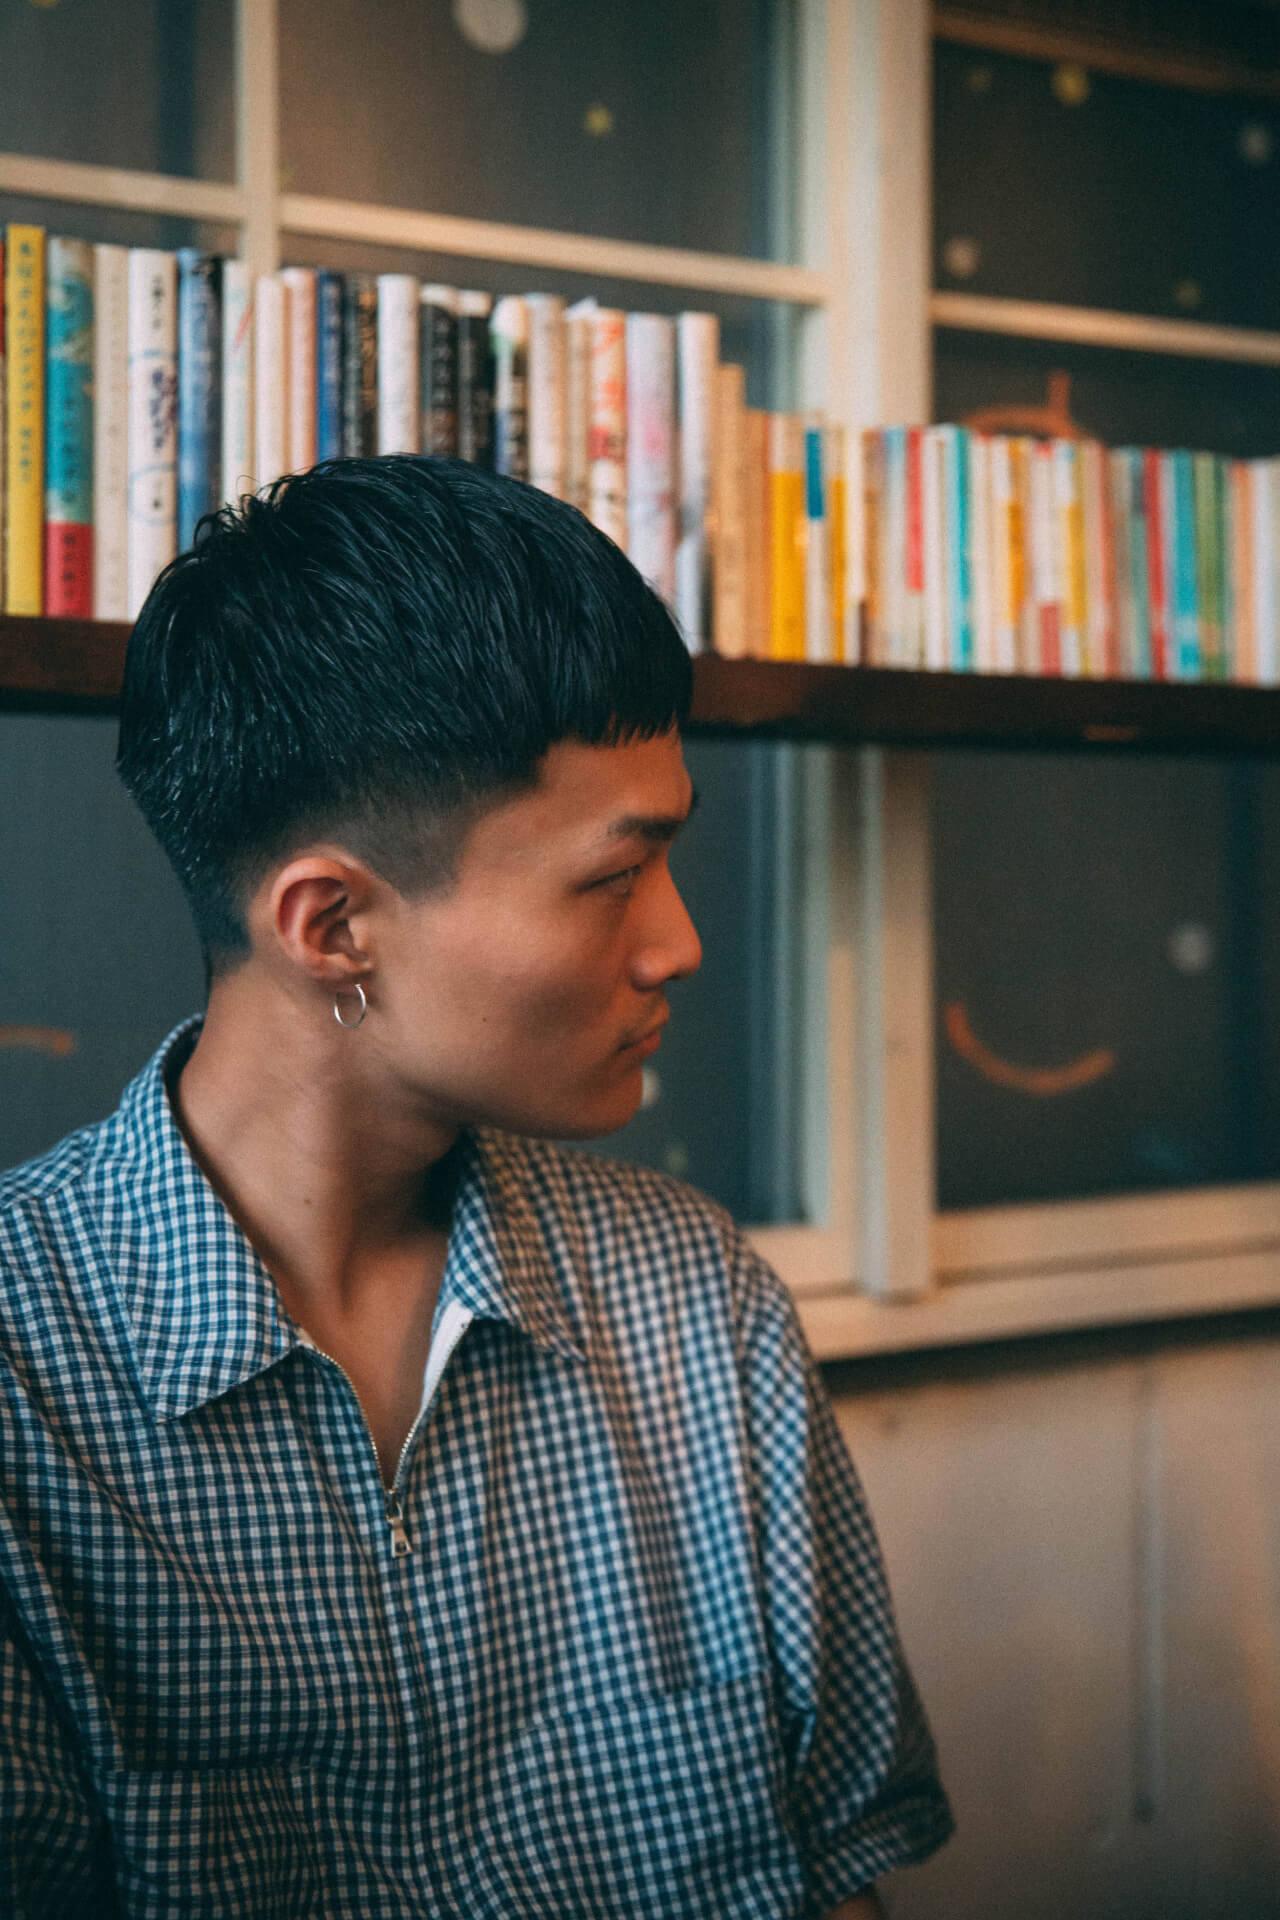 Shin Sakiuraが持つ無数の顔 — 初期衝動と現在地、ワンマンライブを語るインタビュー interview_190909_shinsakiura_766